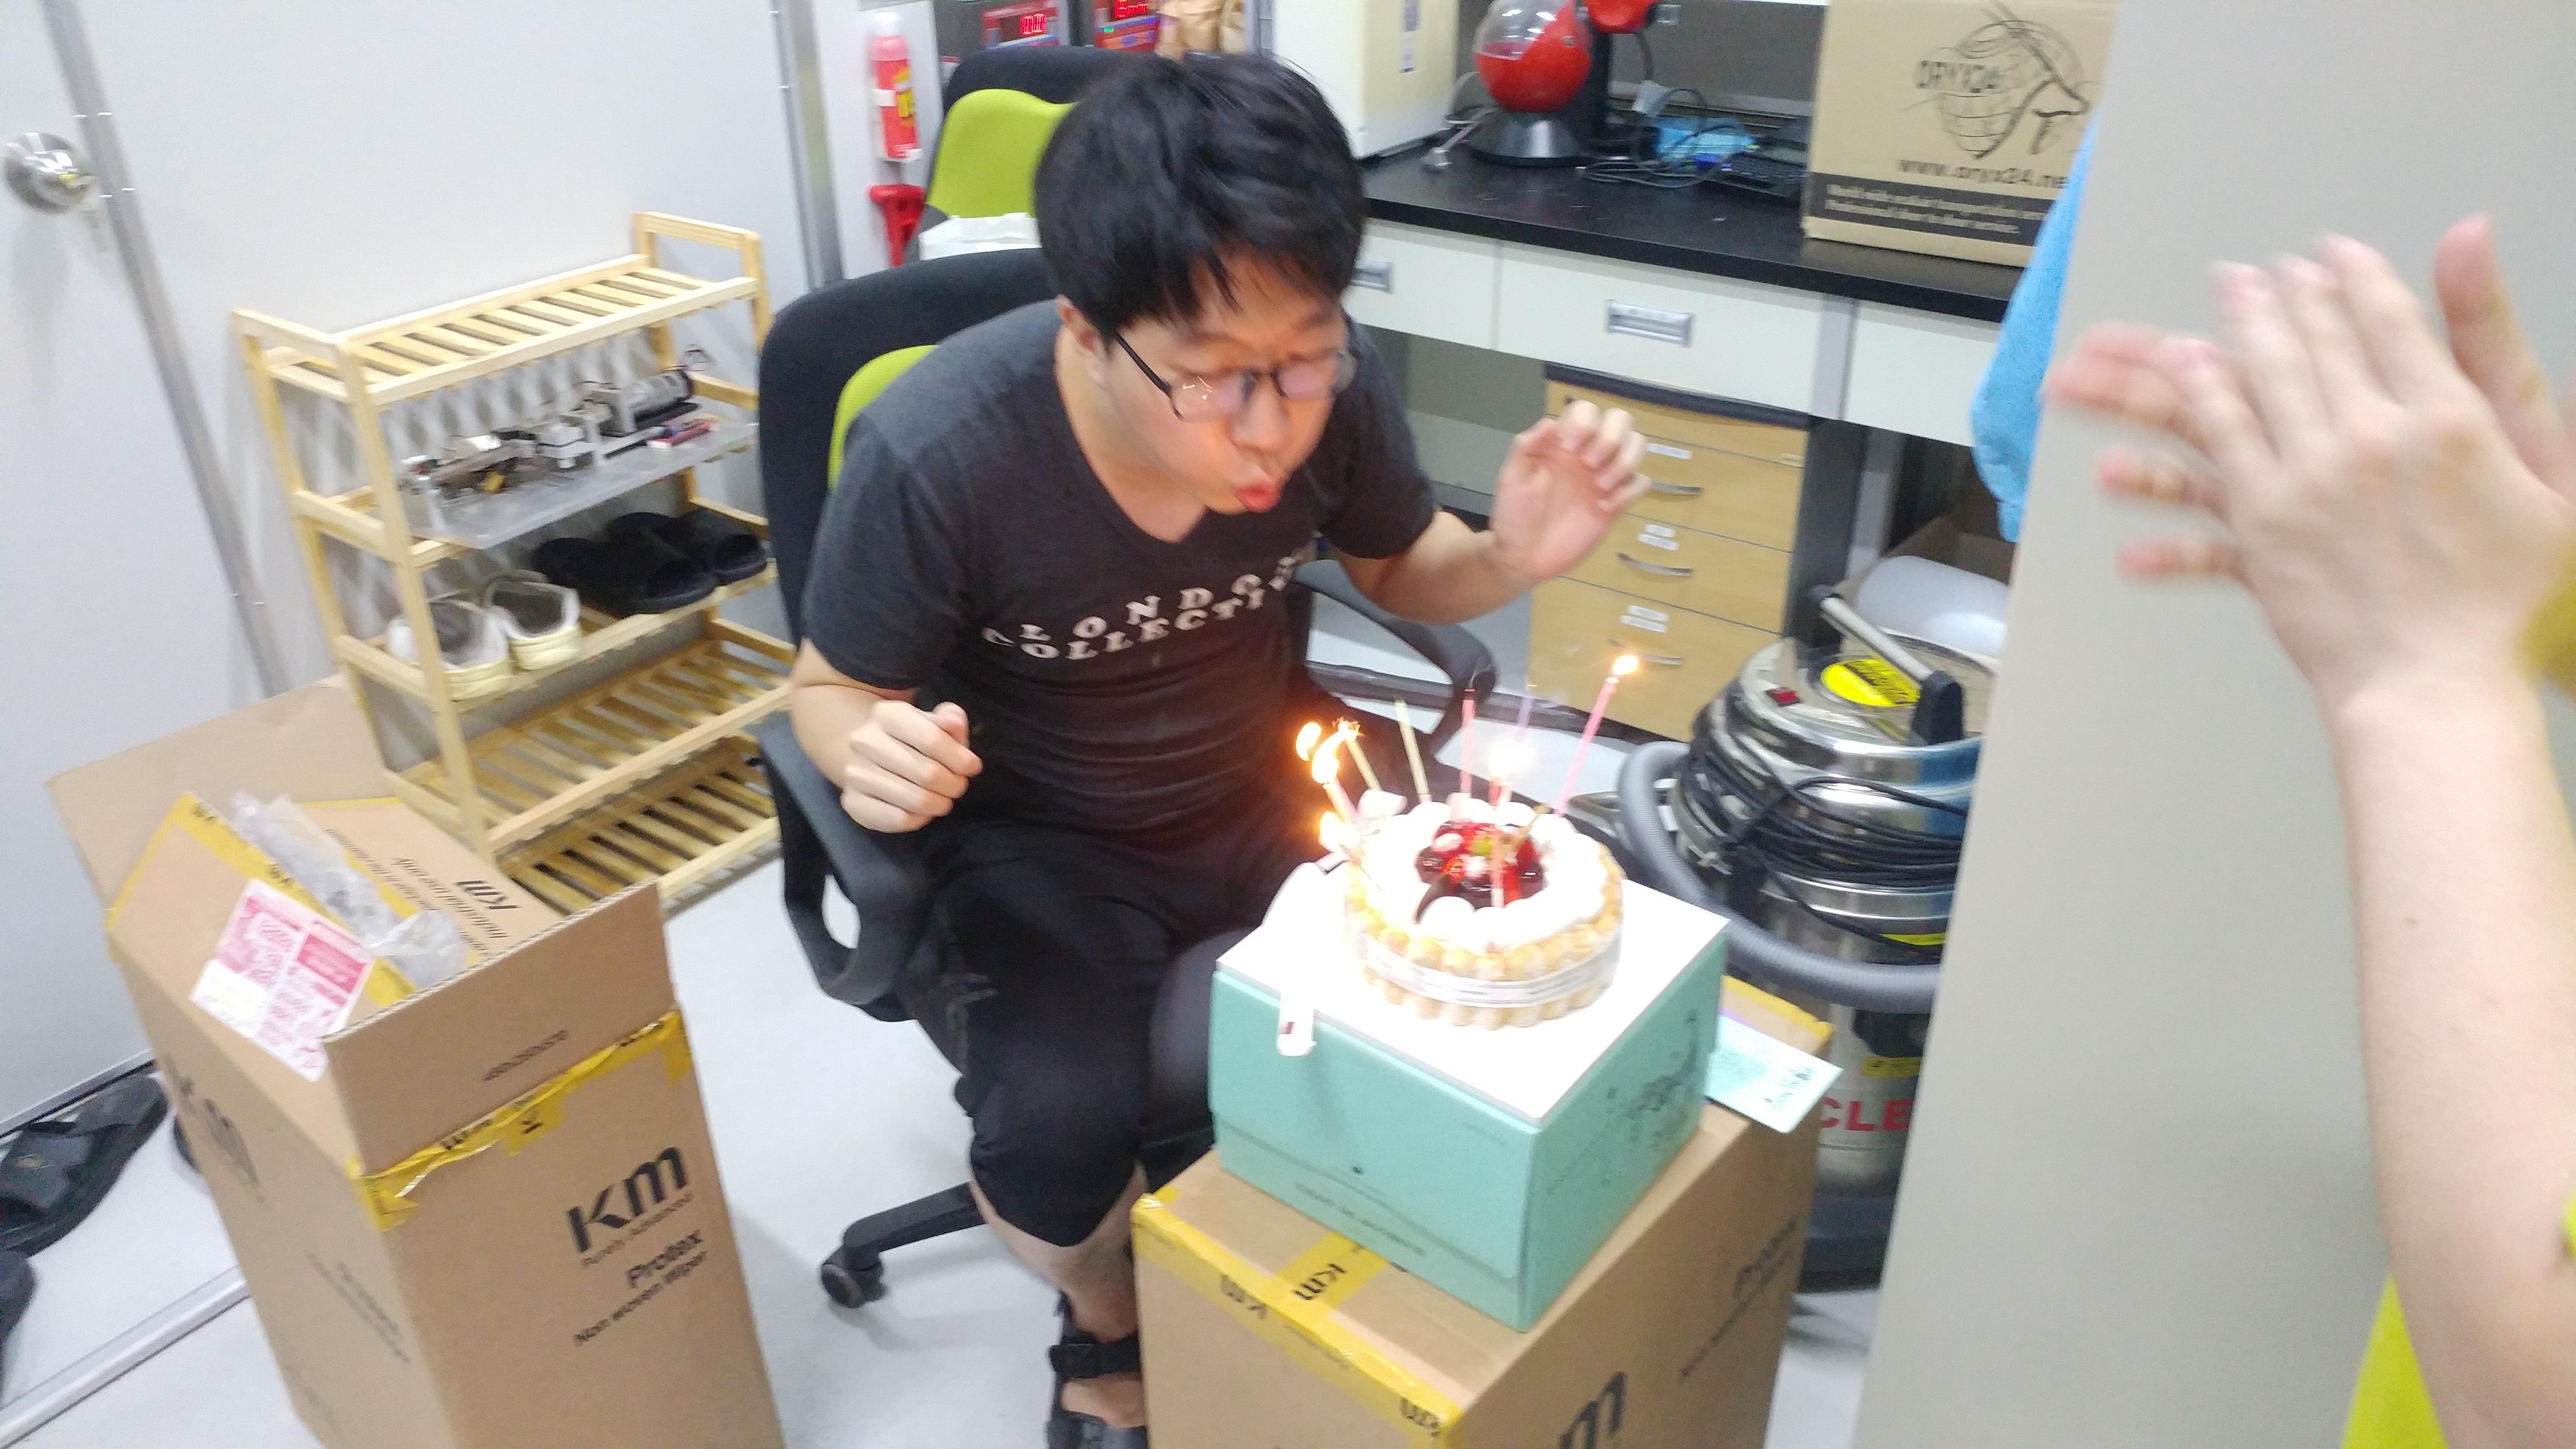 2017.08 C.J. Choi's birthday